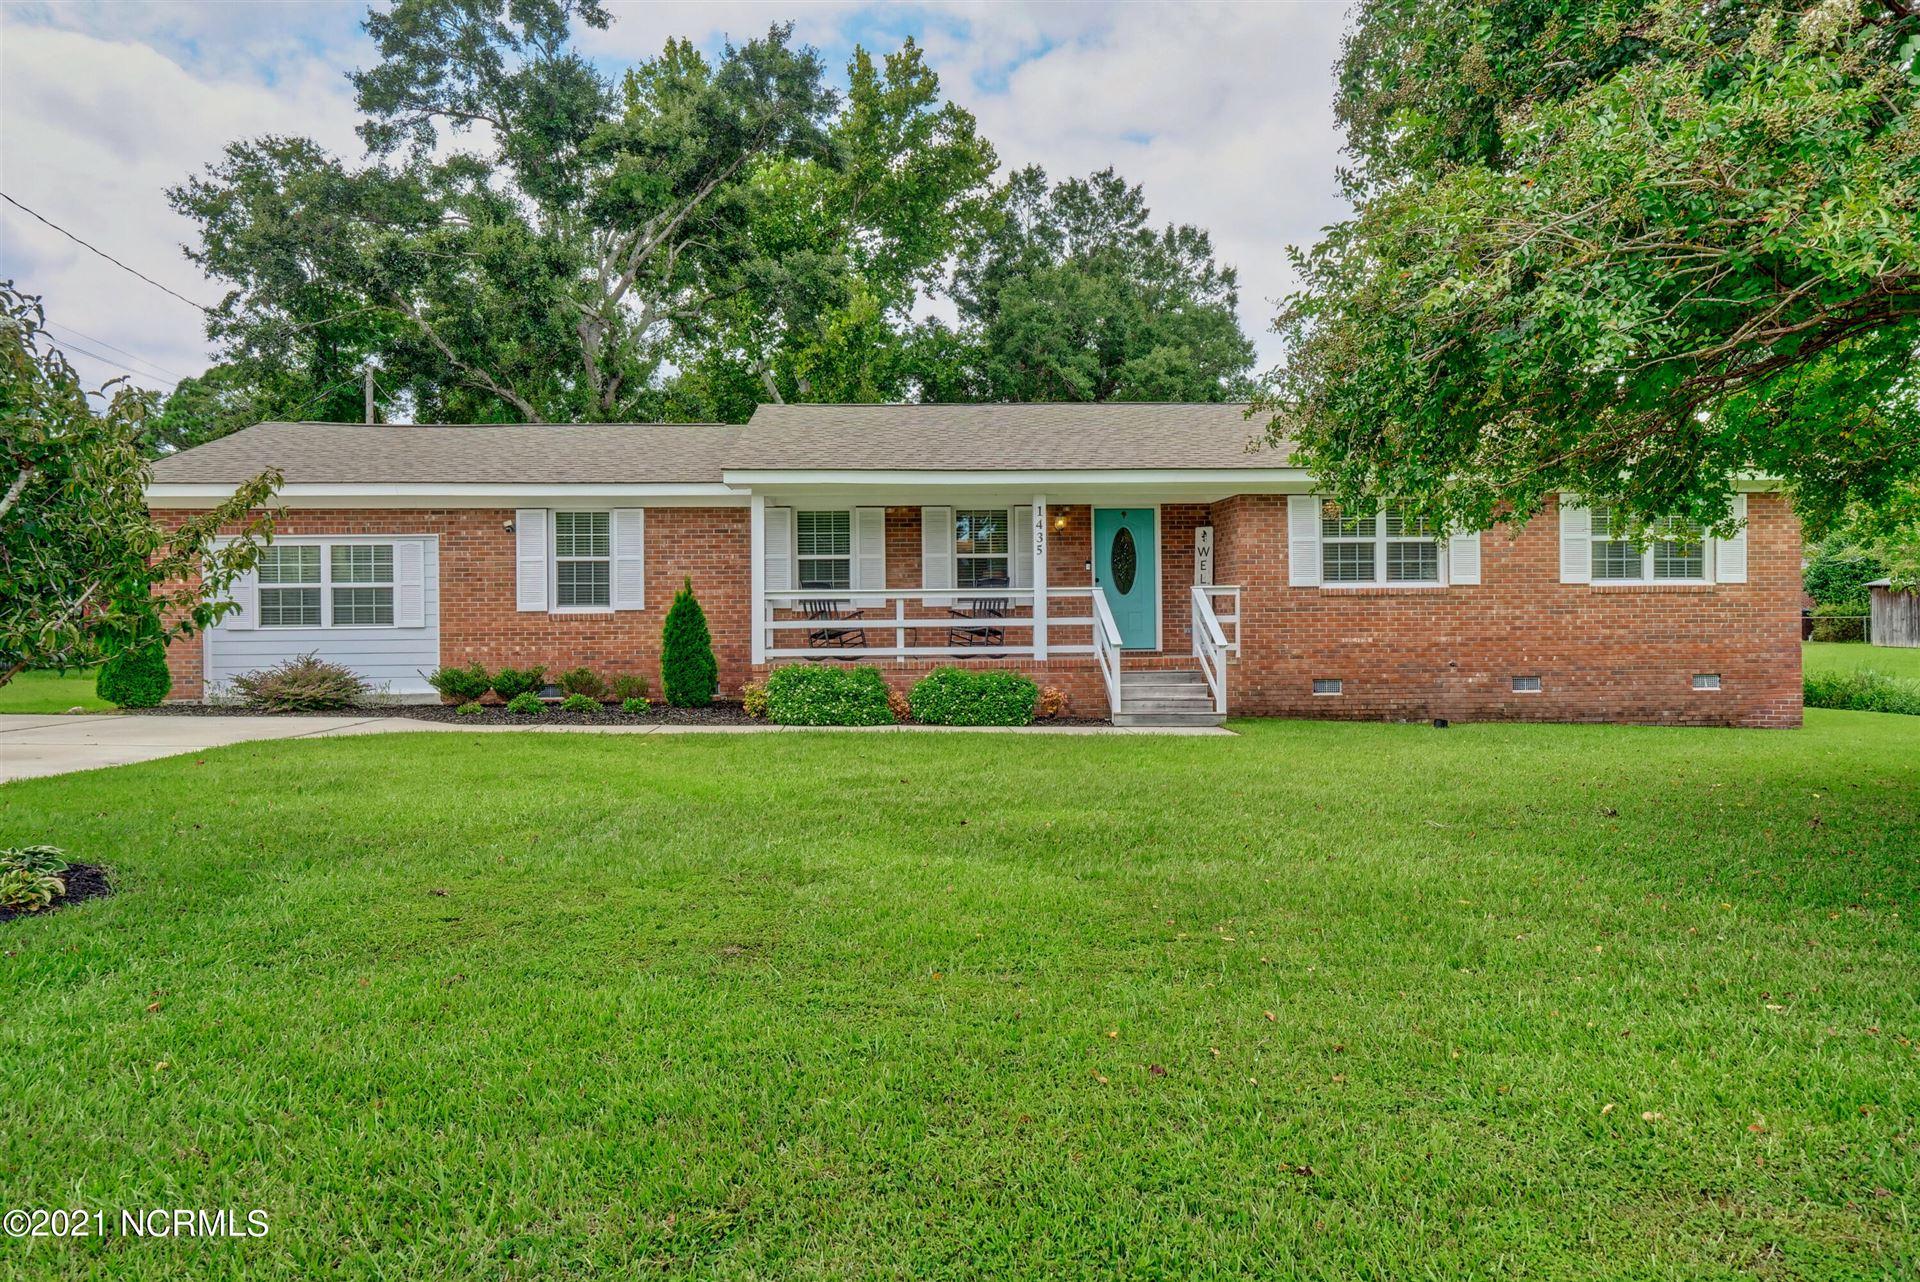 Photo of 1435 Robert E Lee Drive, Wilmington, NC 28412 (MLS # 100289663)